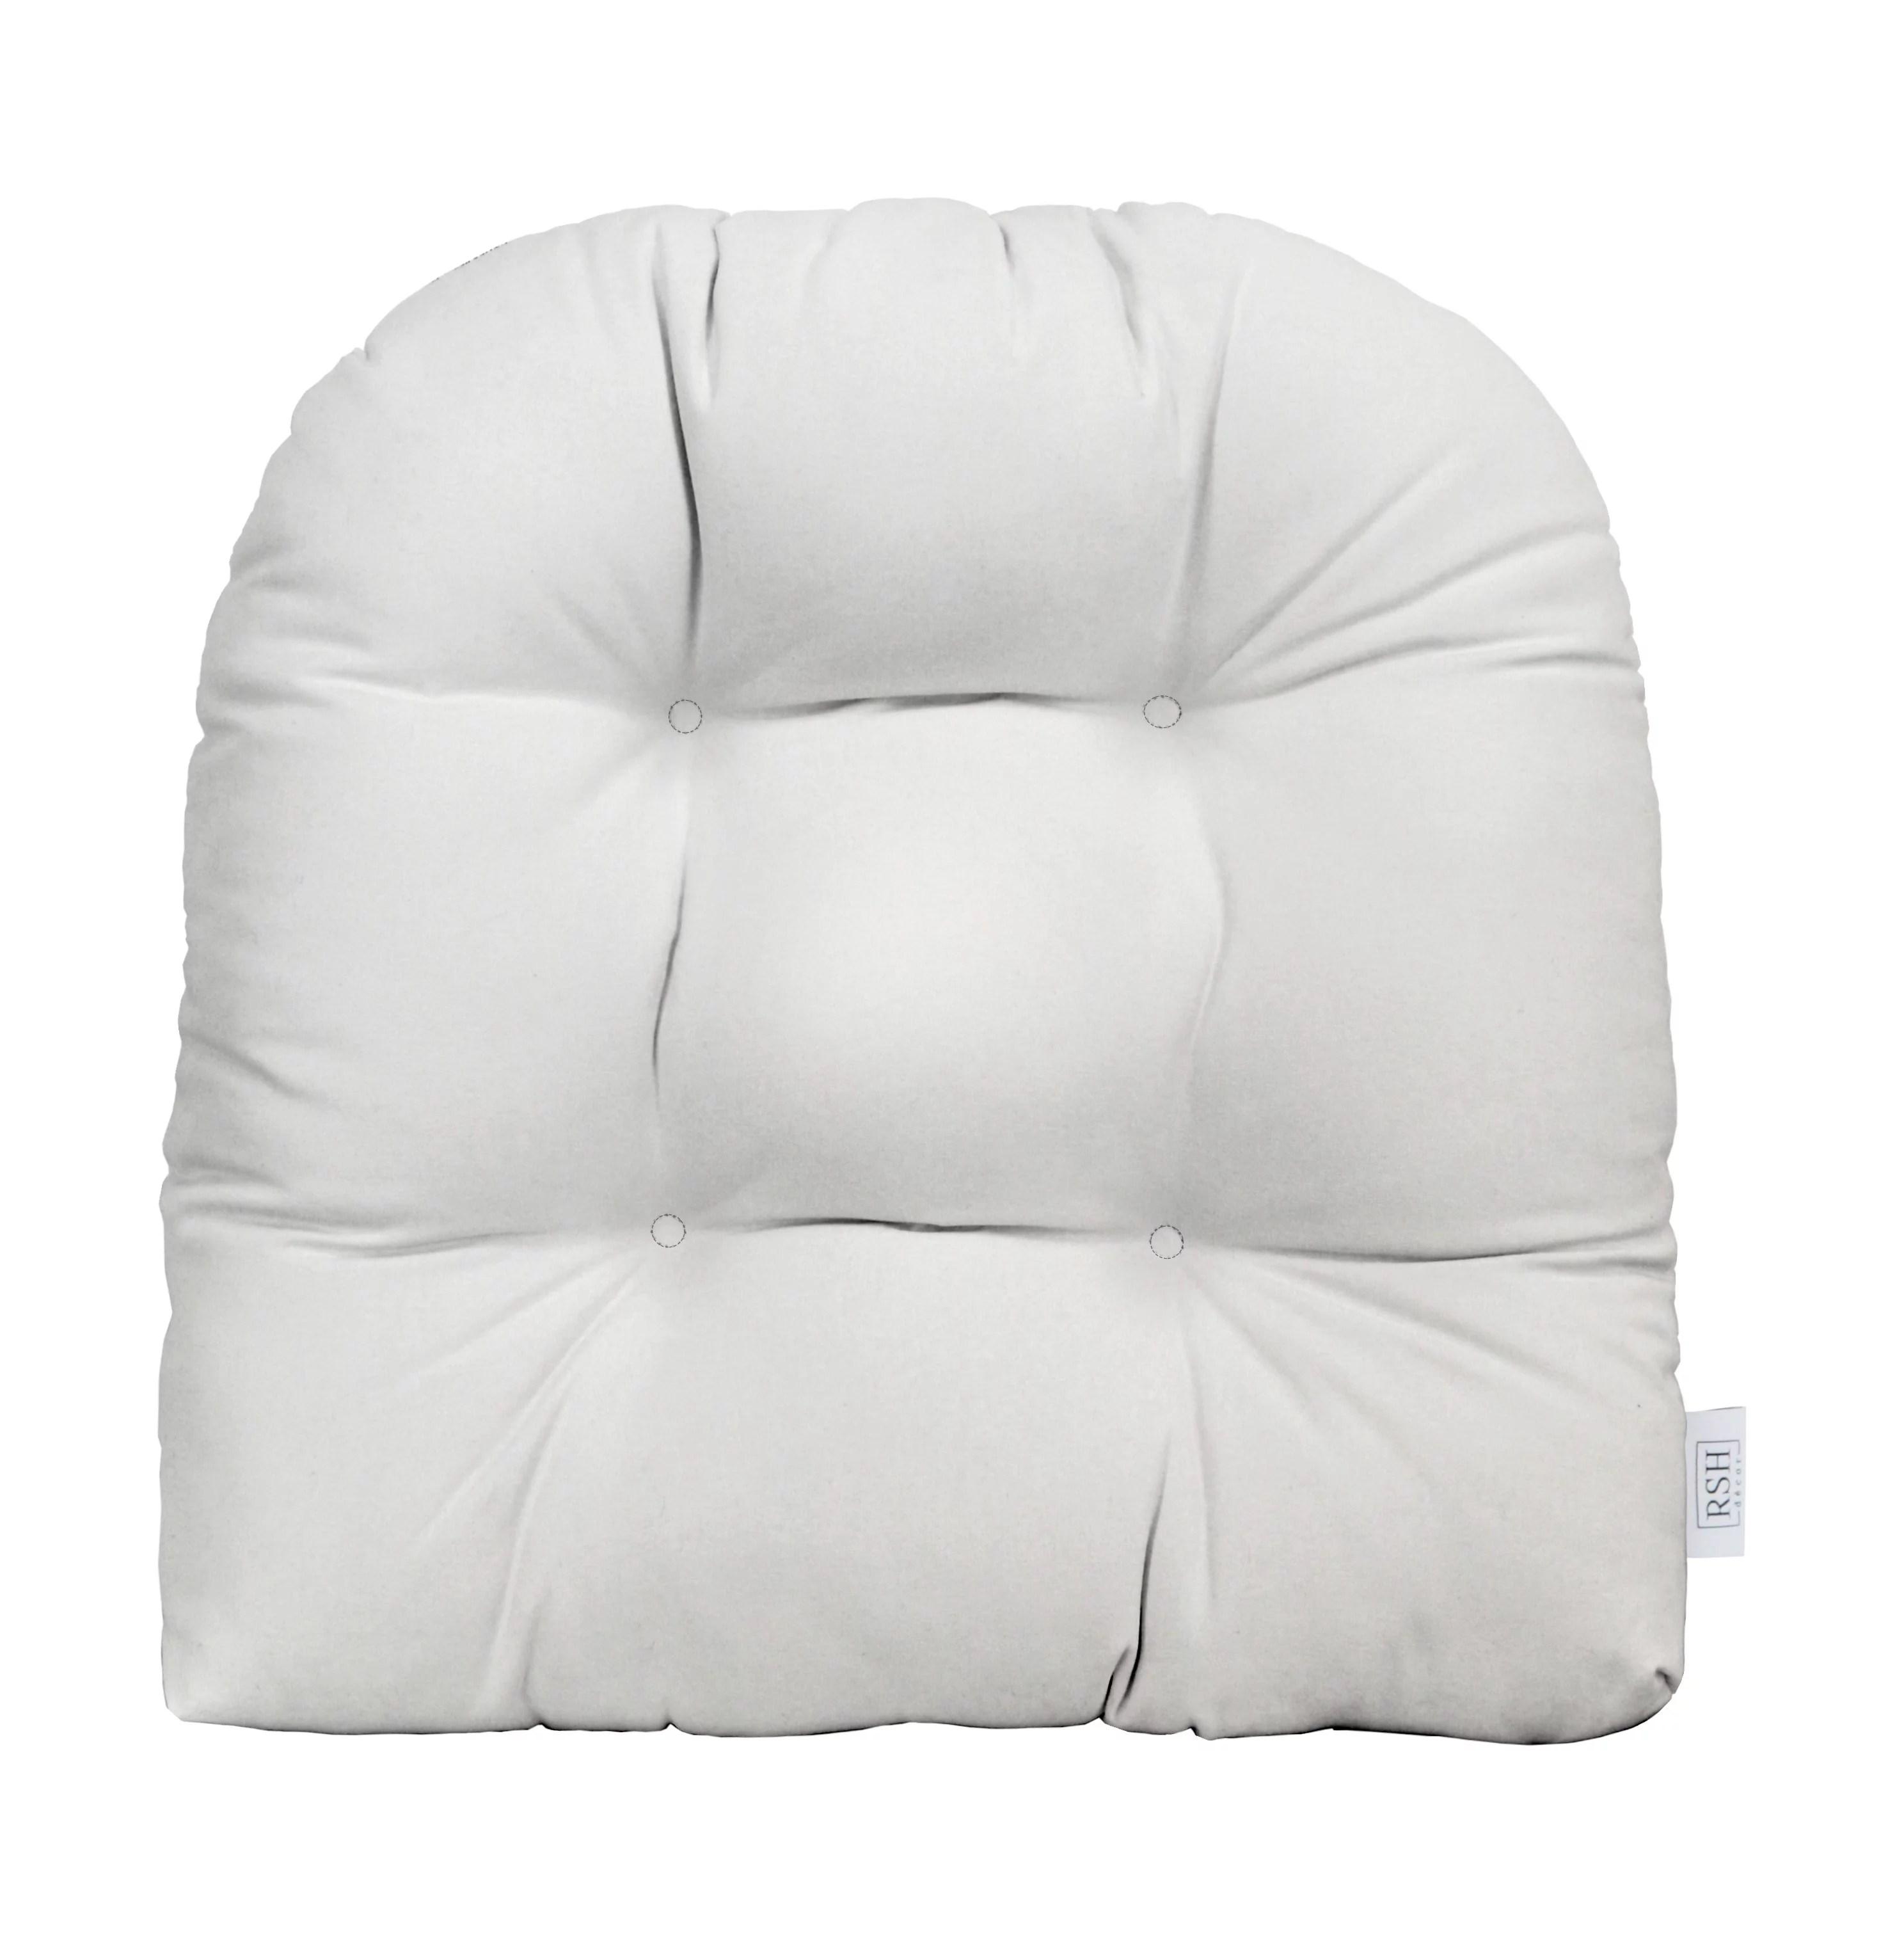 rsh decor indoor outdoor u shape universal wicker tufted seat cushion patio weather resistant sunbrella canvas white